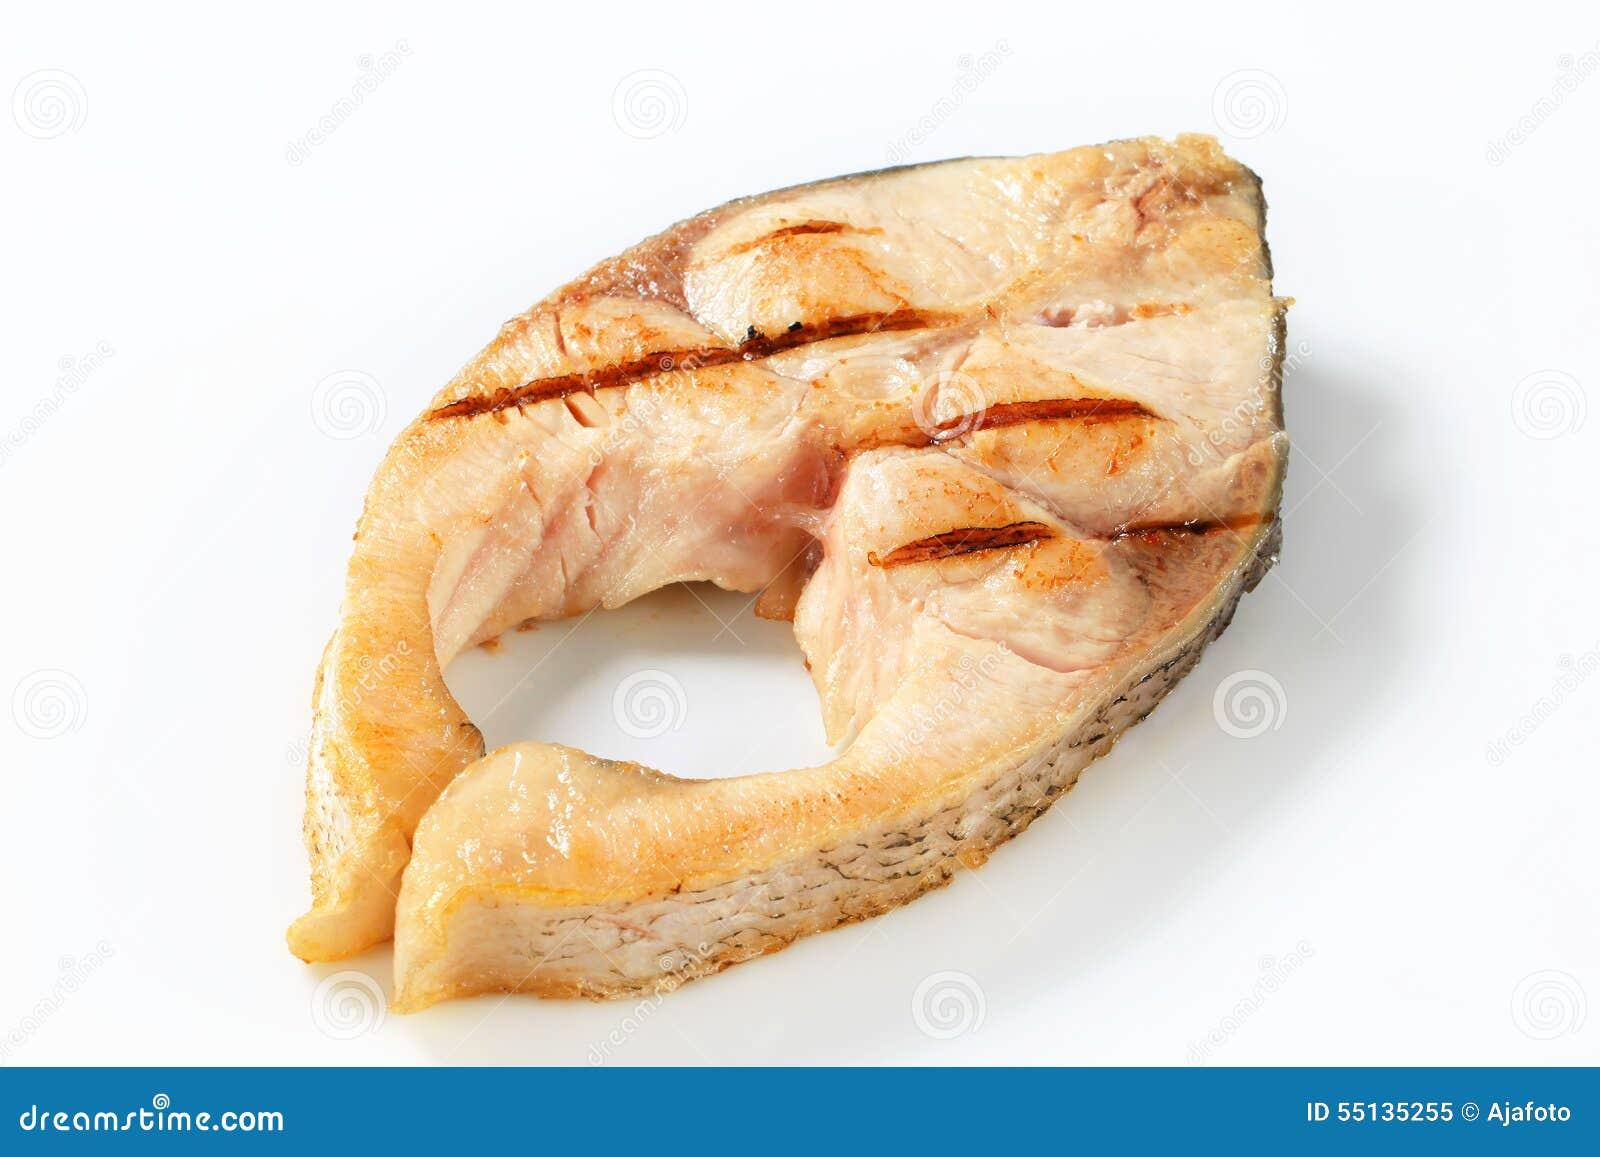 Grilled Fish Steak Stock Photo - Image: 55135255